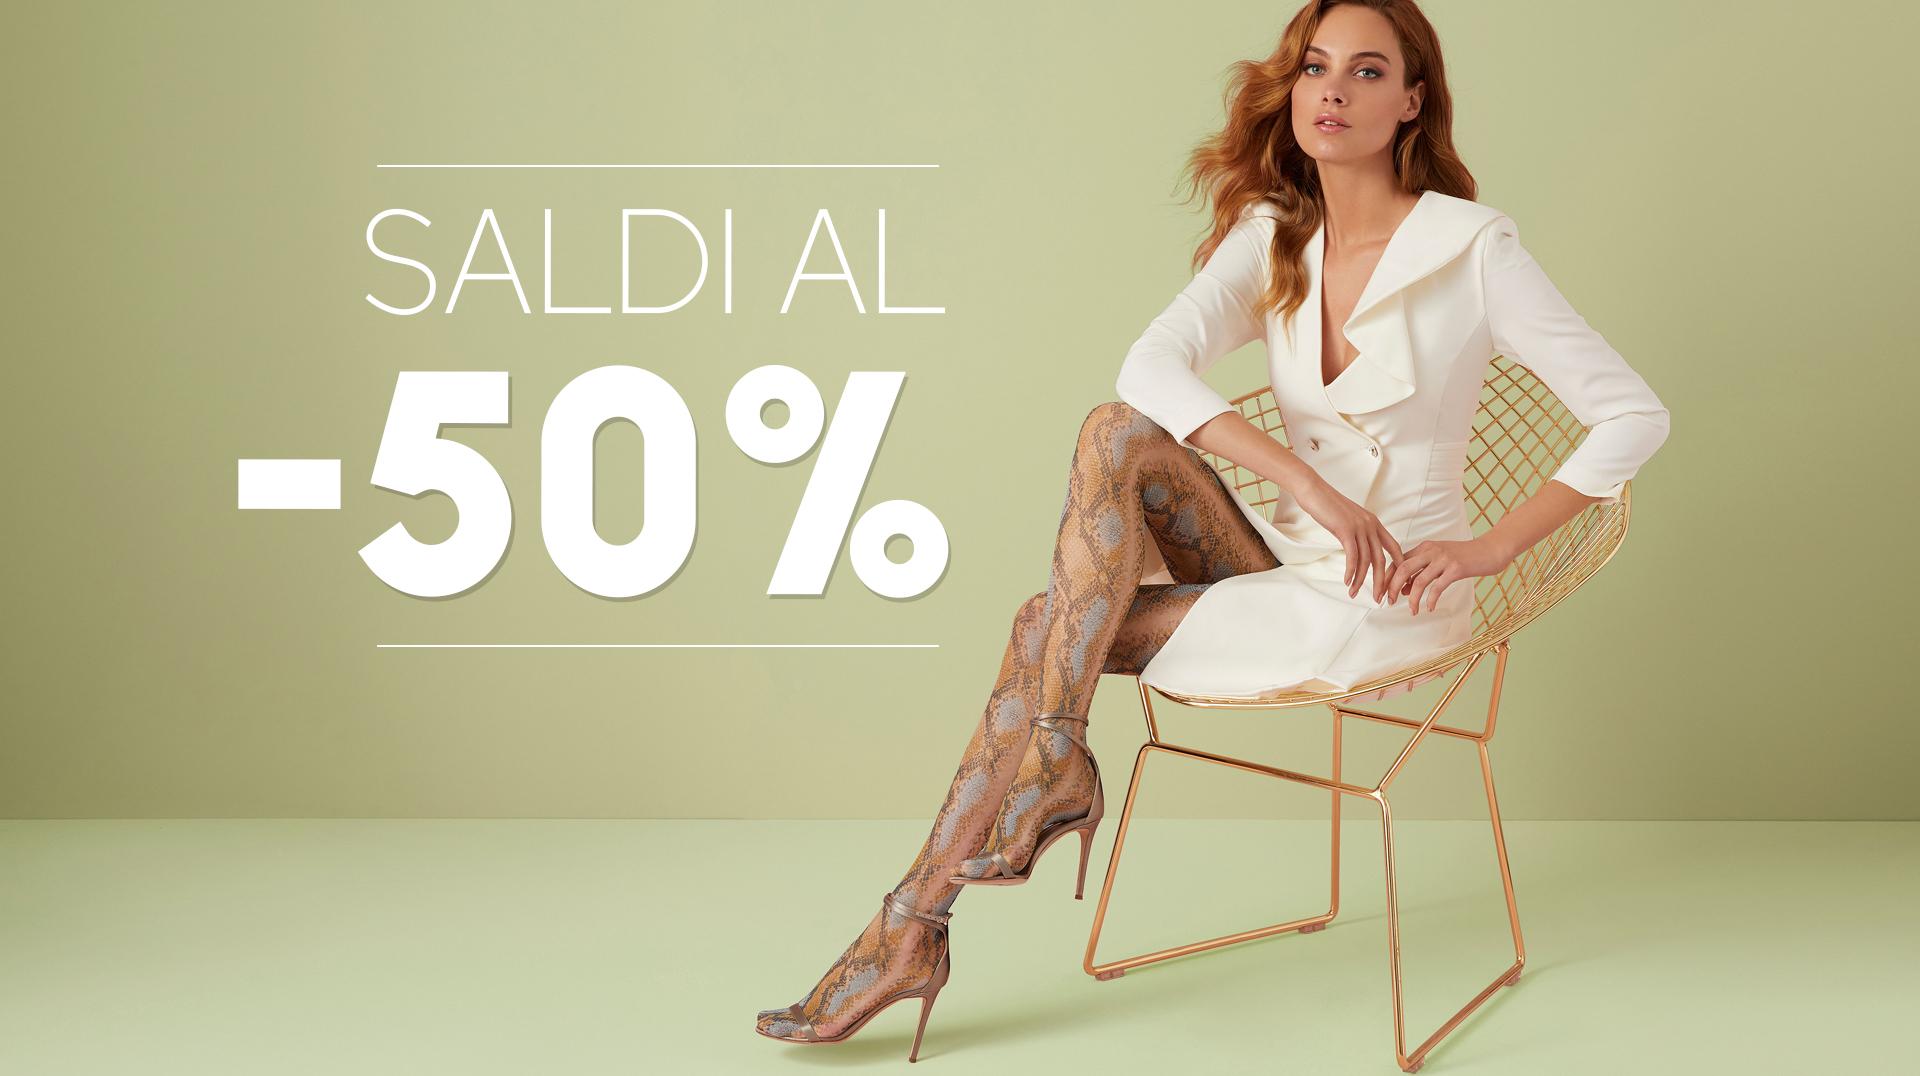 SALDI AL 50%